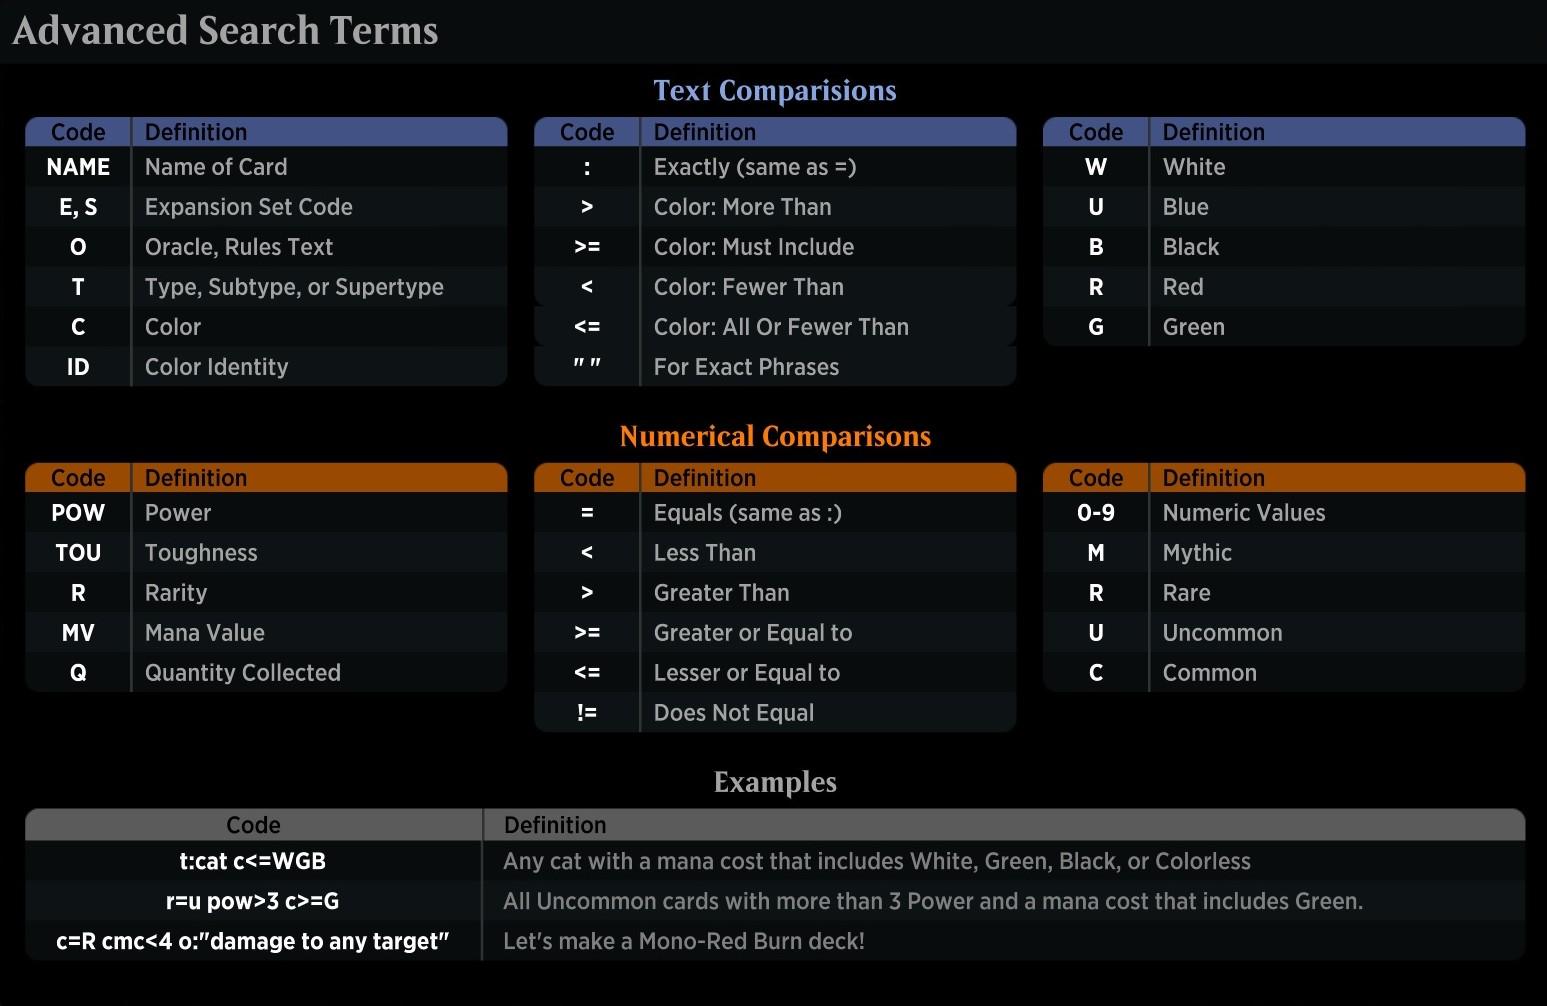 Advanced Search Terms